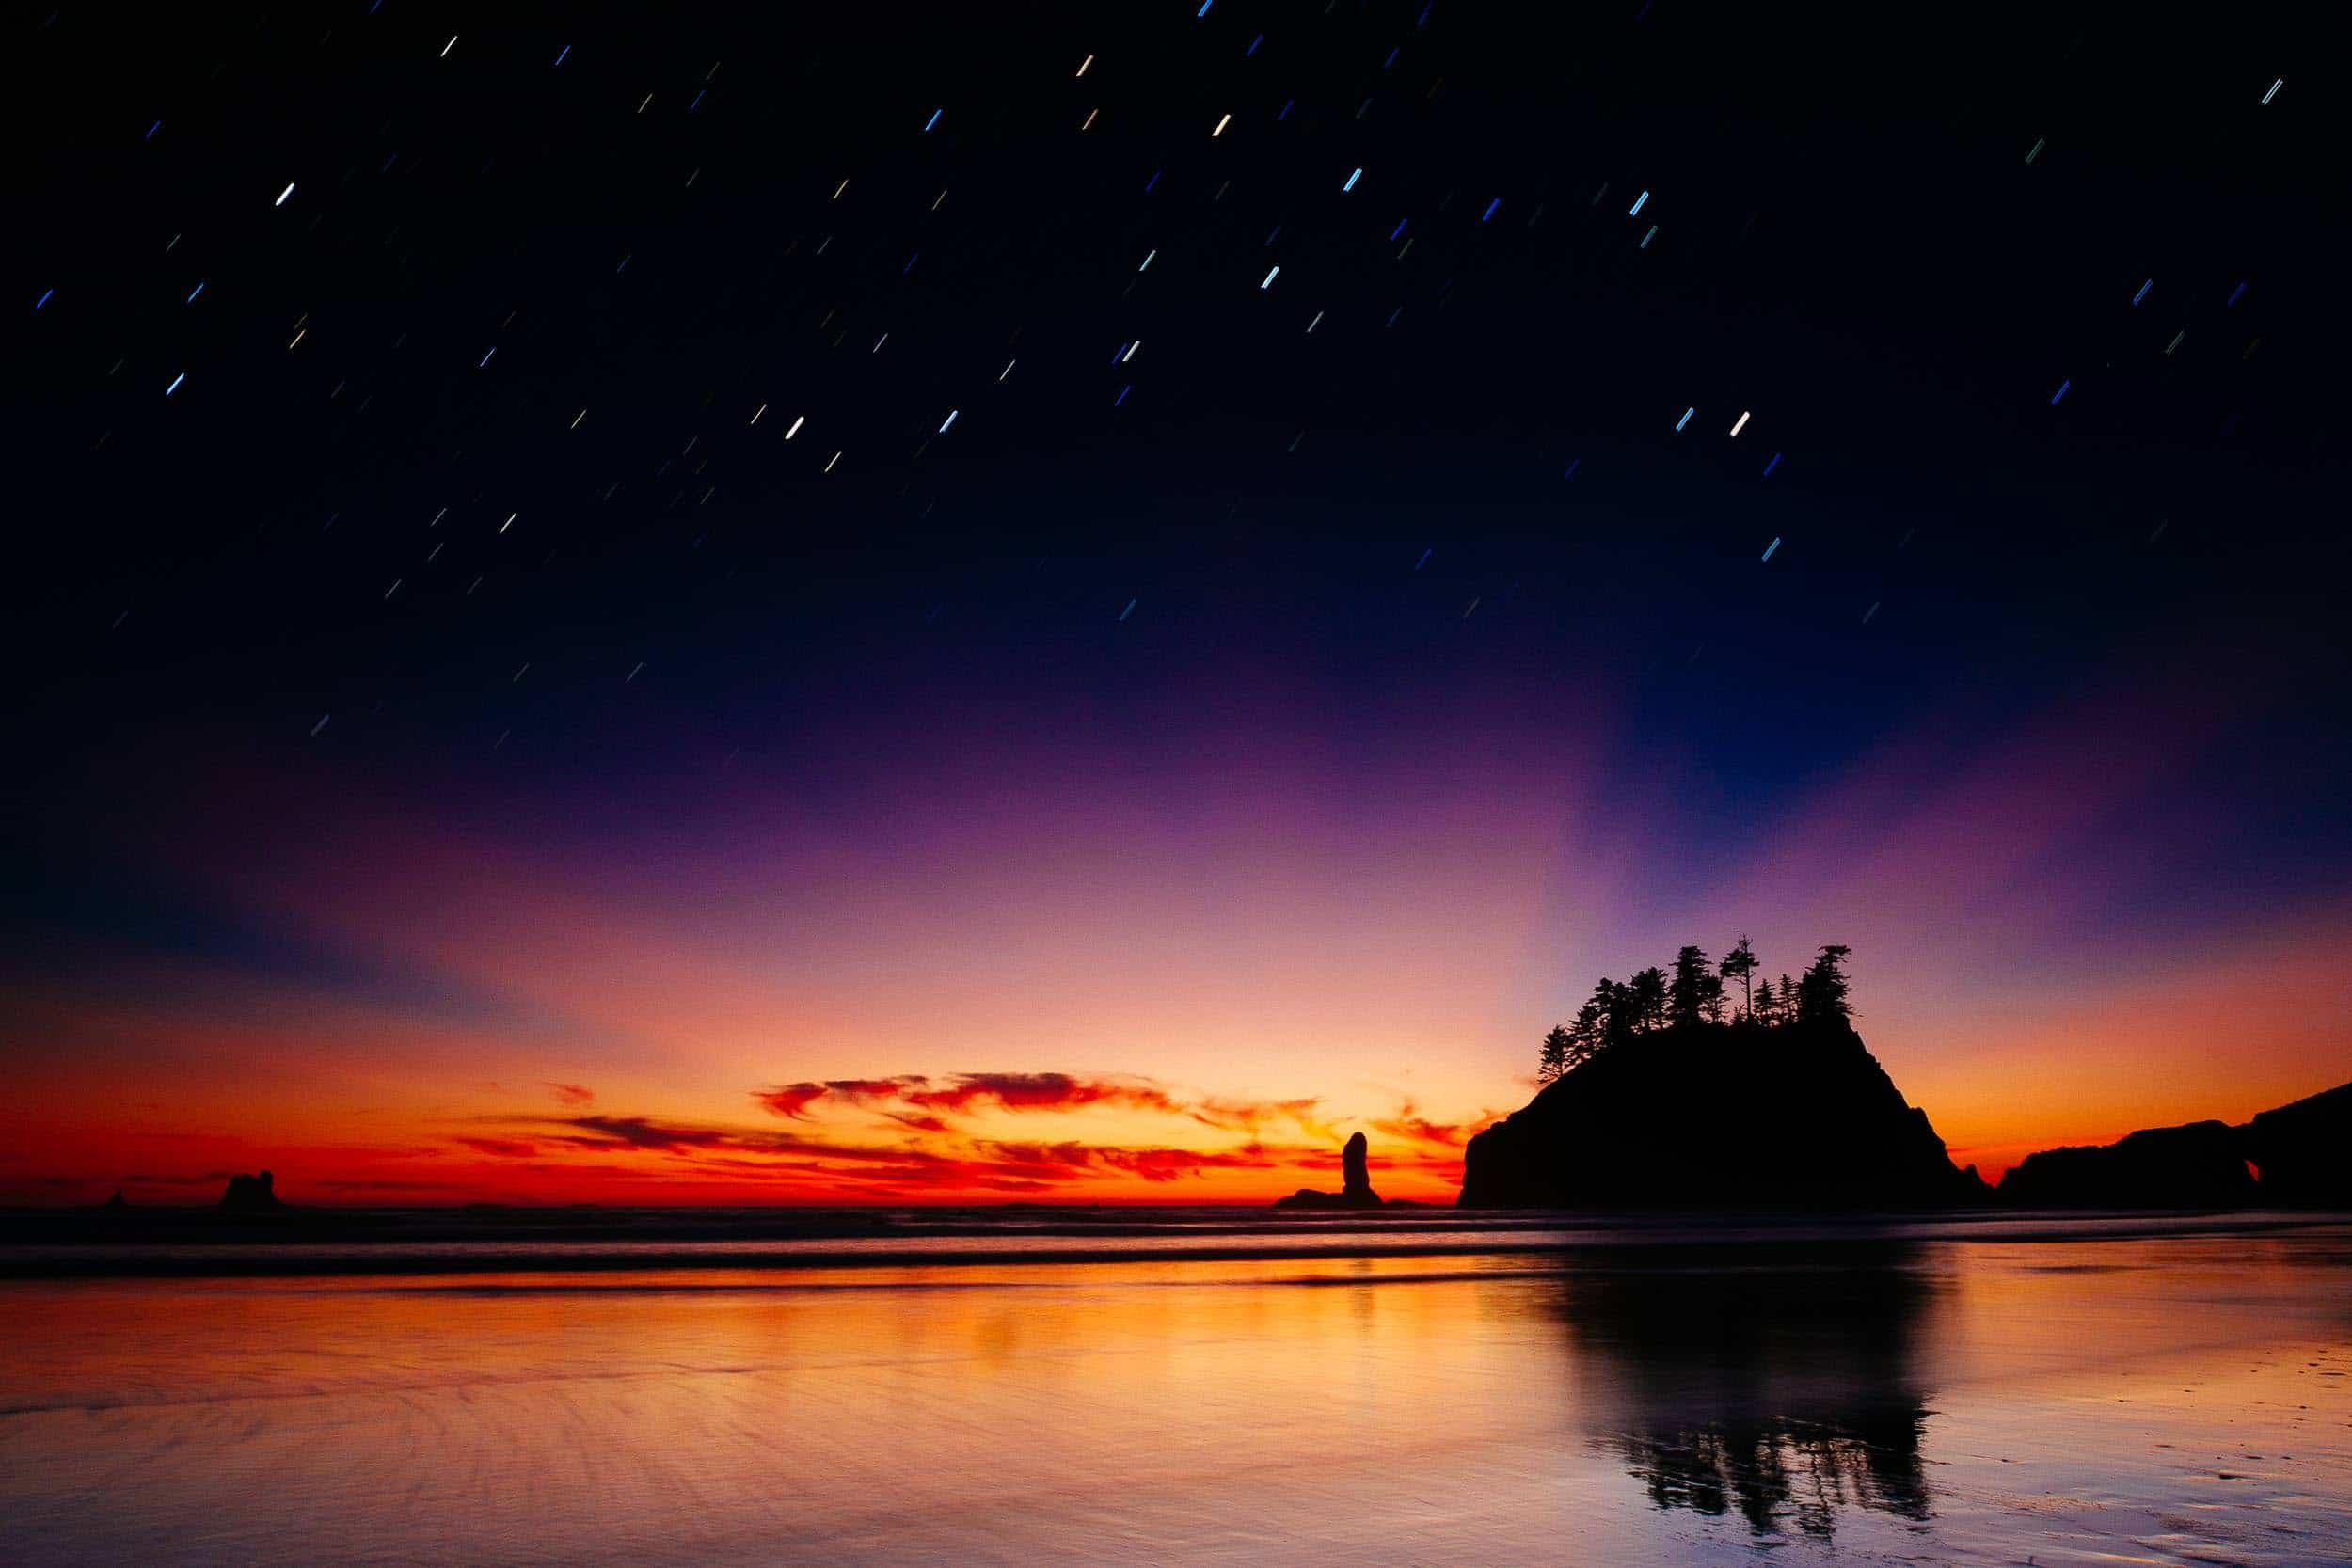 Olympic Photo Adventure - Seasick Silhouette with stars overhead